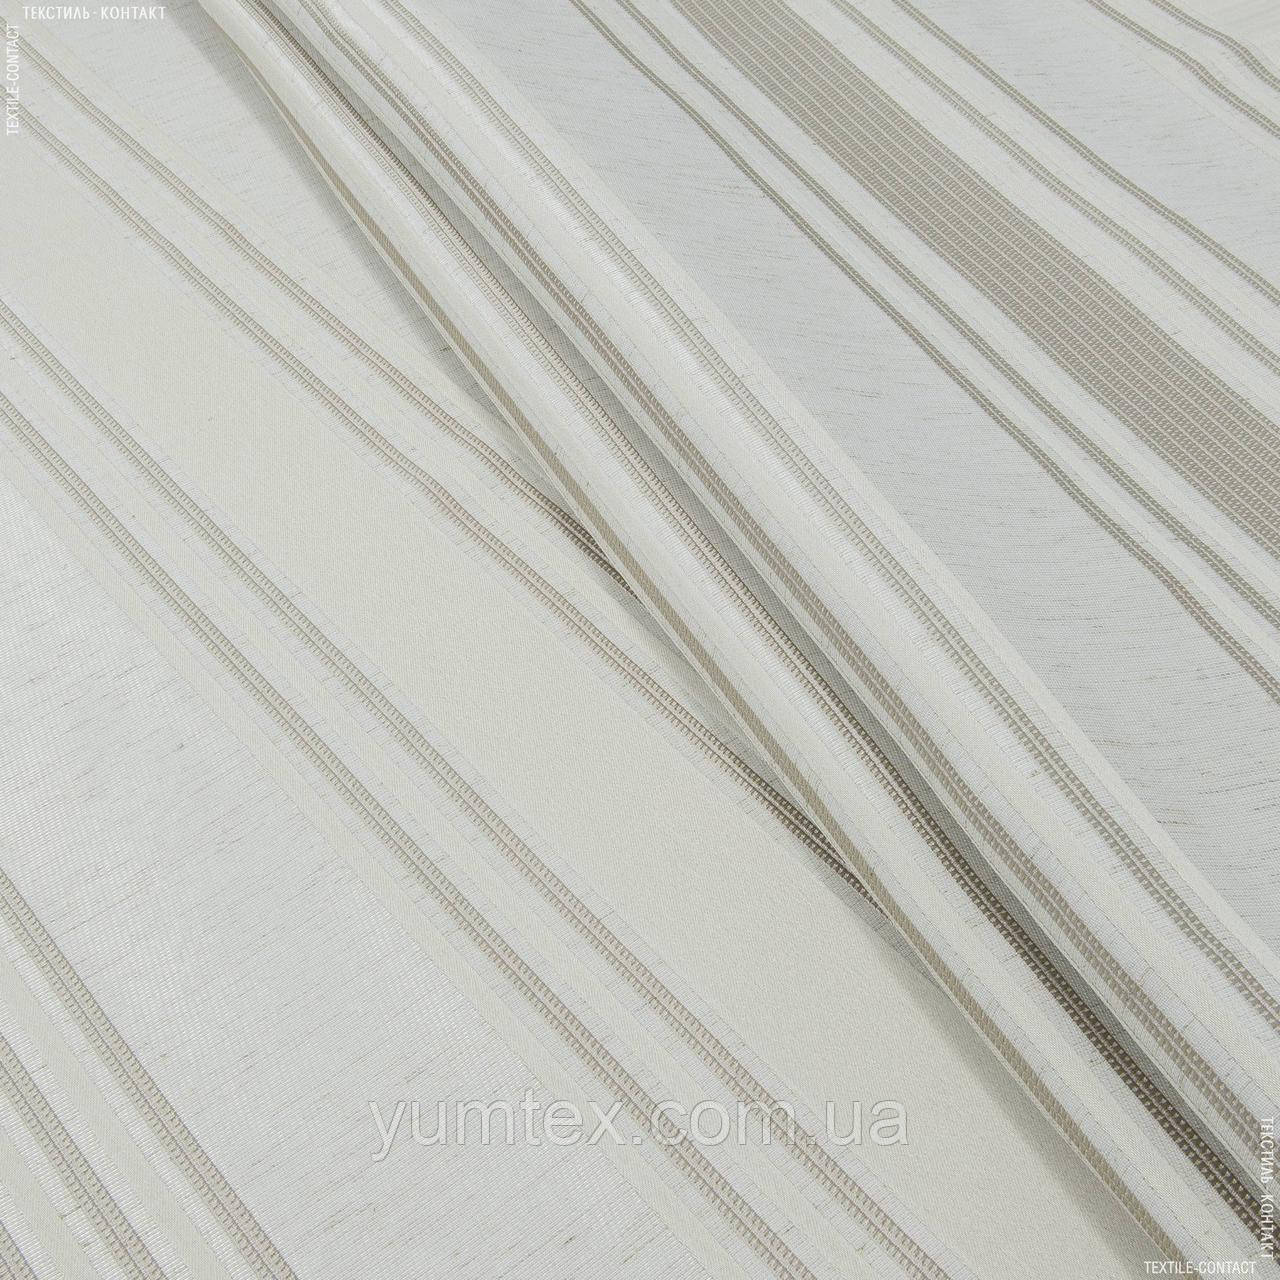 Жаккард сан-ремо 137004